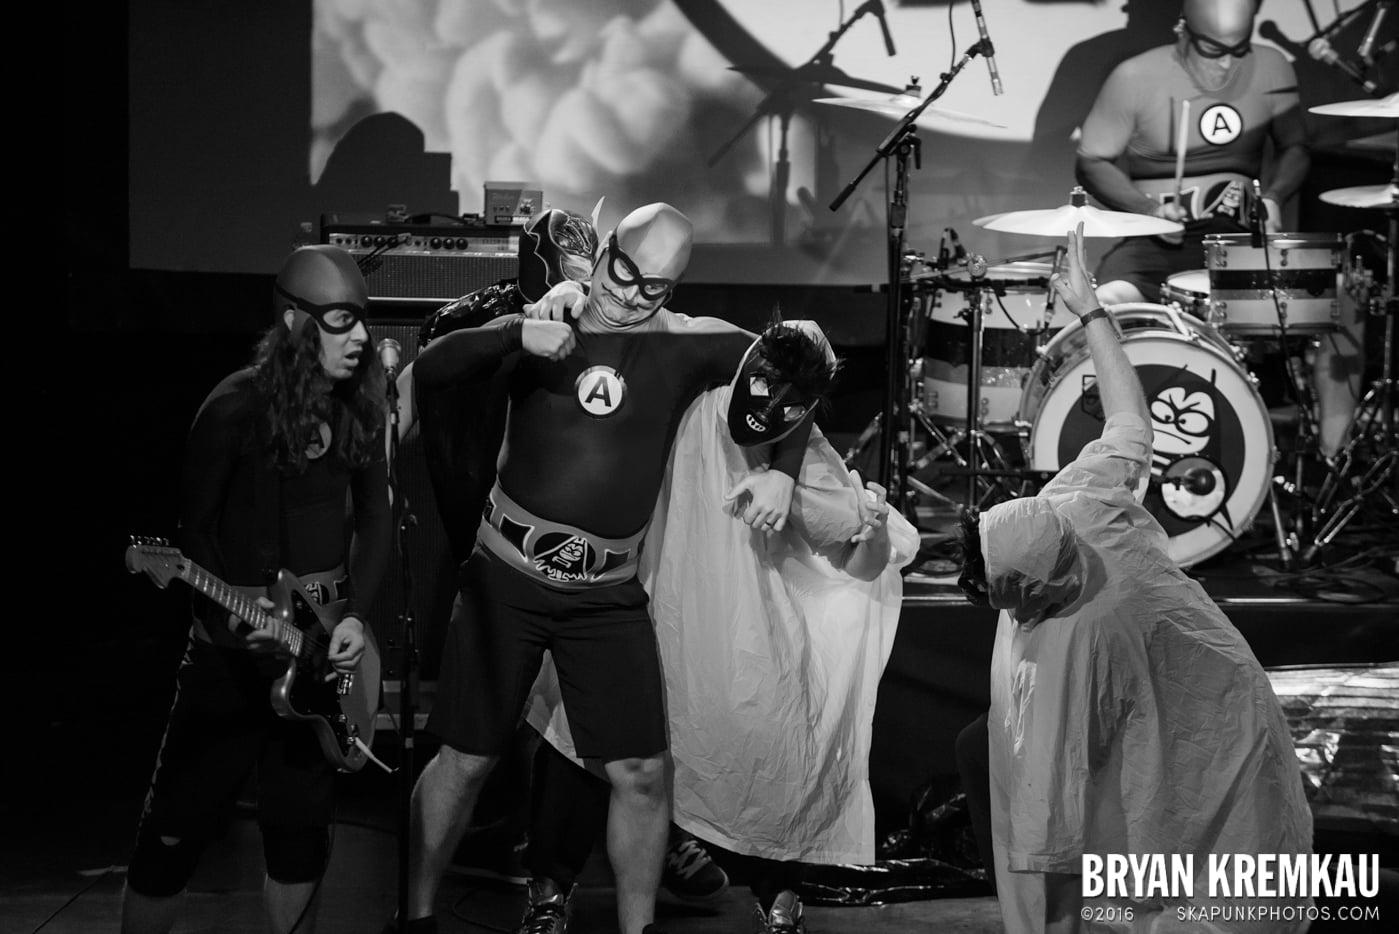 The Aquabats @ Irving Plaza, NYC - 5.7.14 (12)